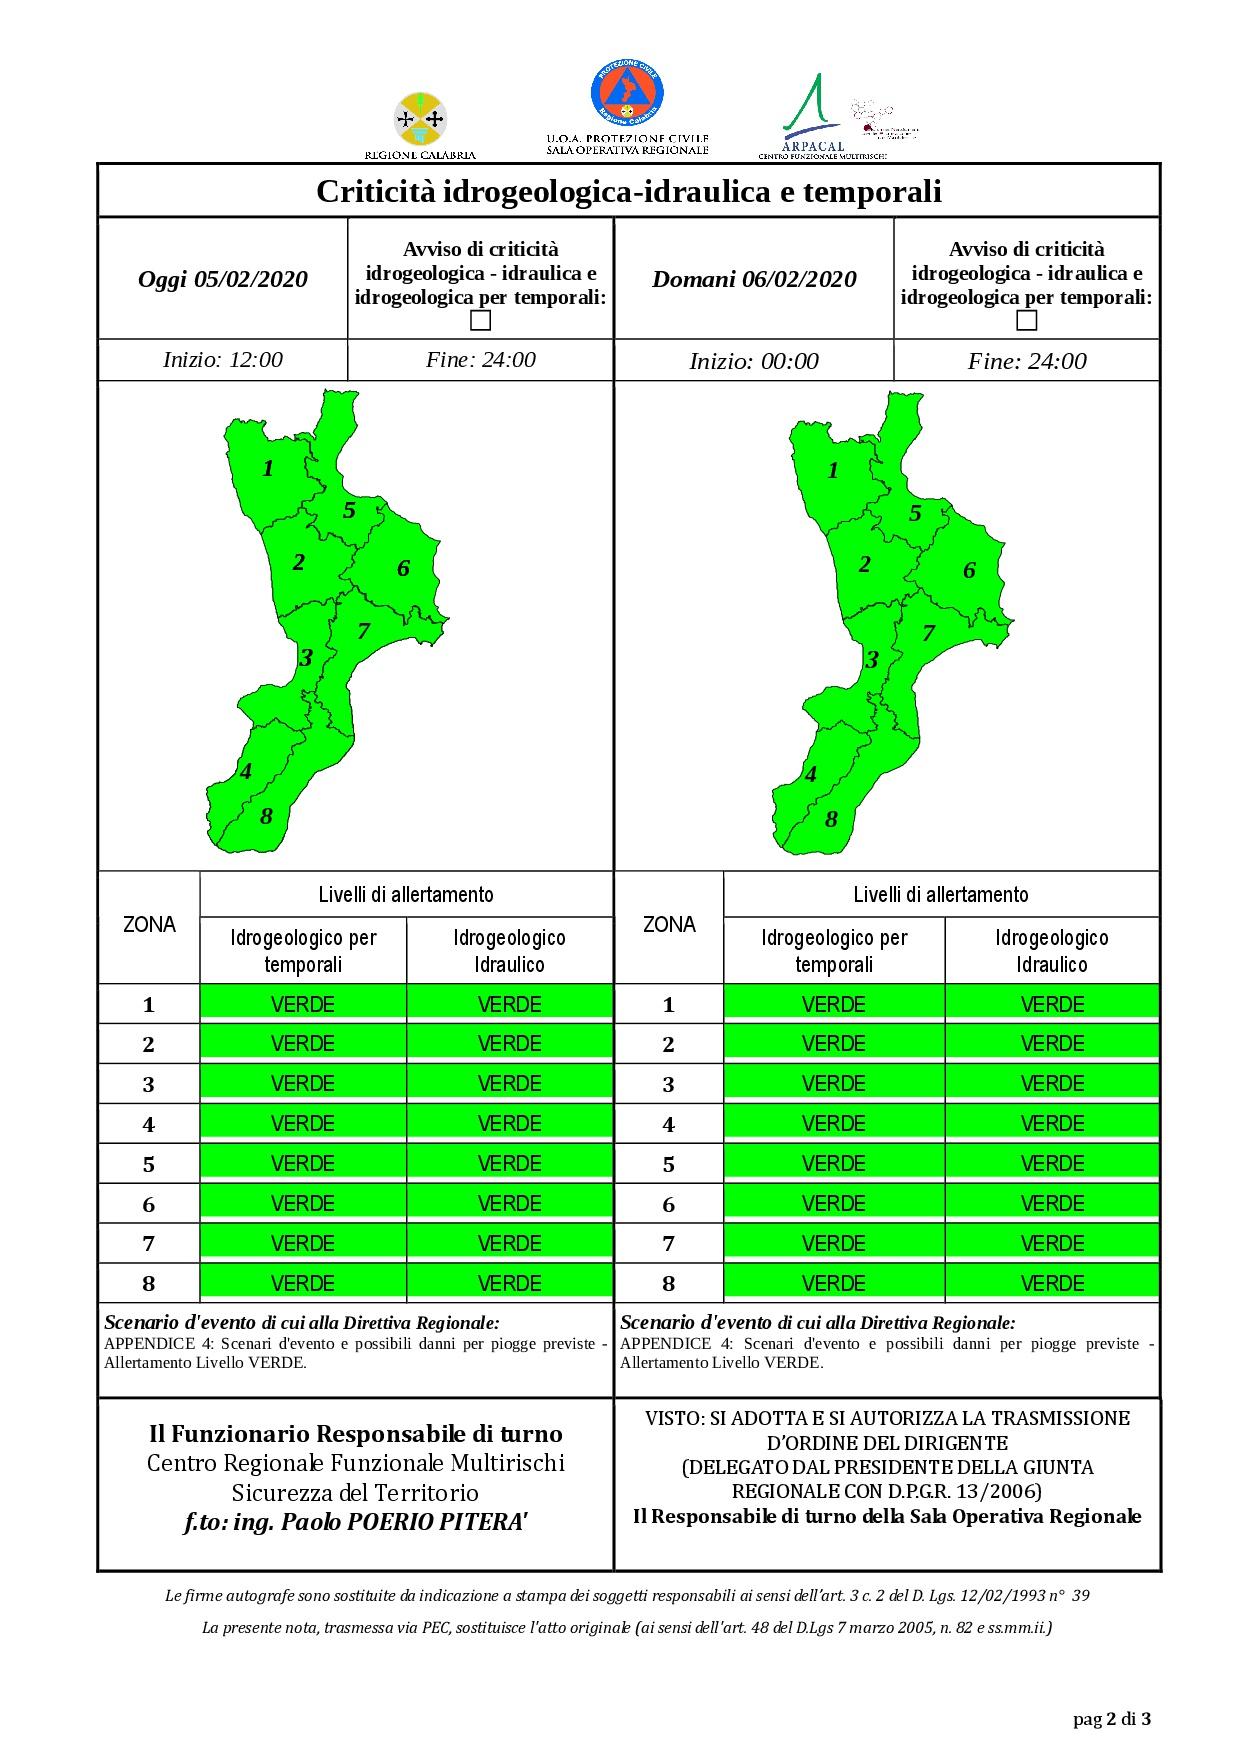 Criticità idrogeologica-idraulica e temporali in Calabria 05-02-2020